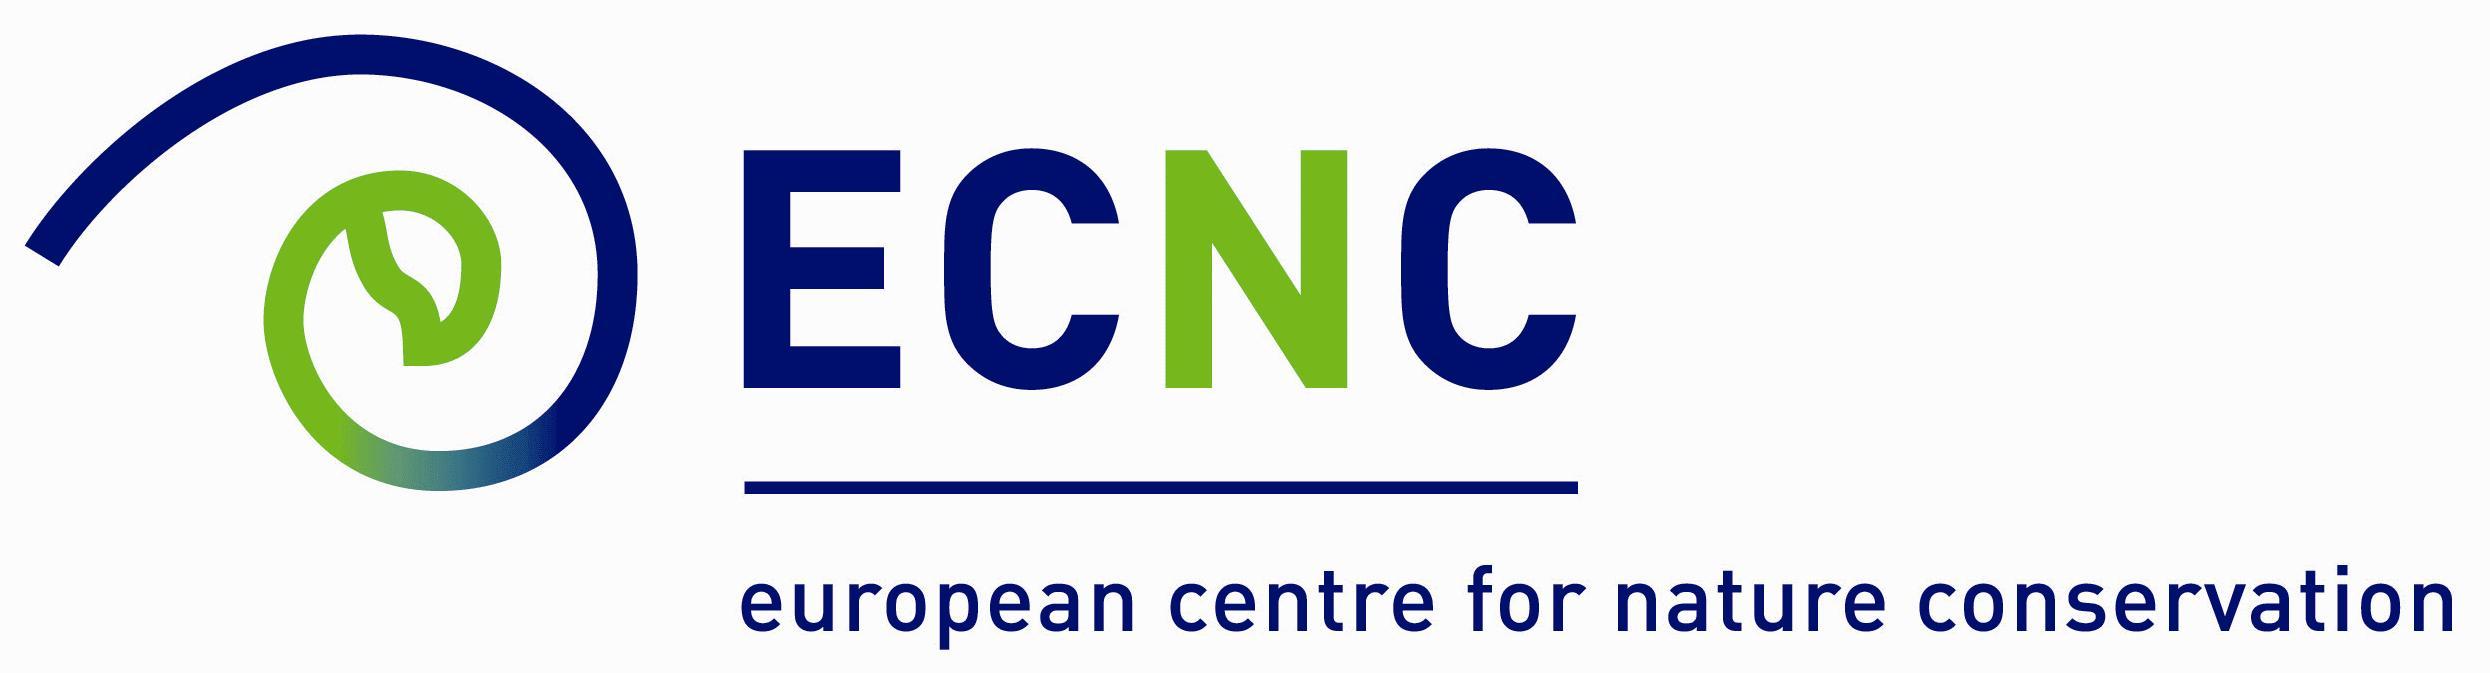 logo for ECNC - European Centre for Nature Conservation